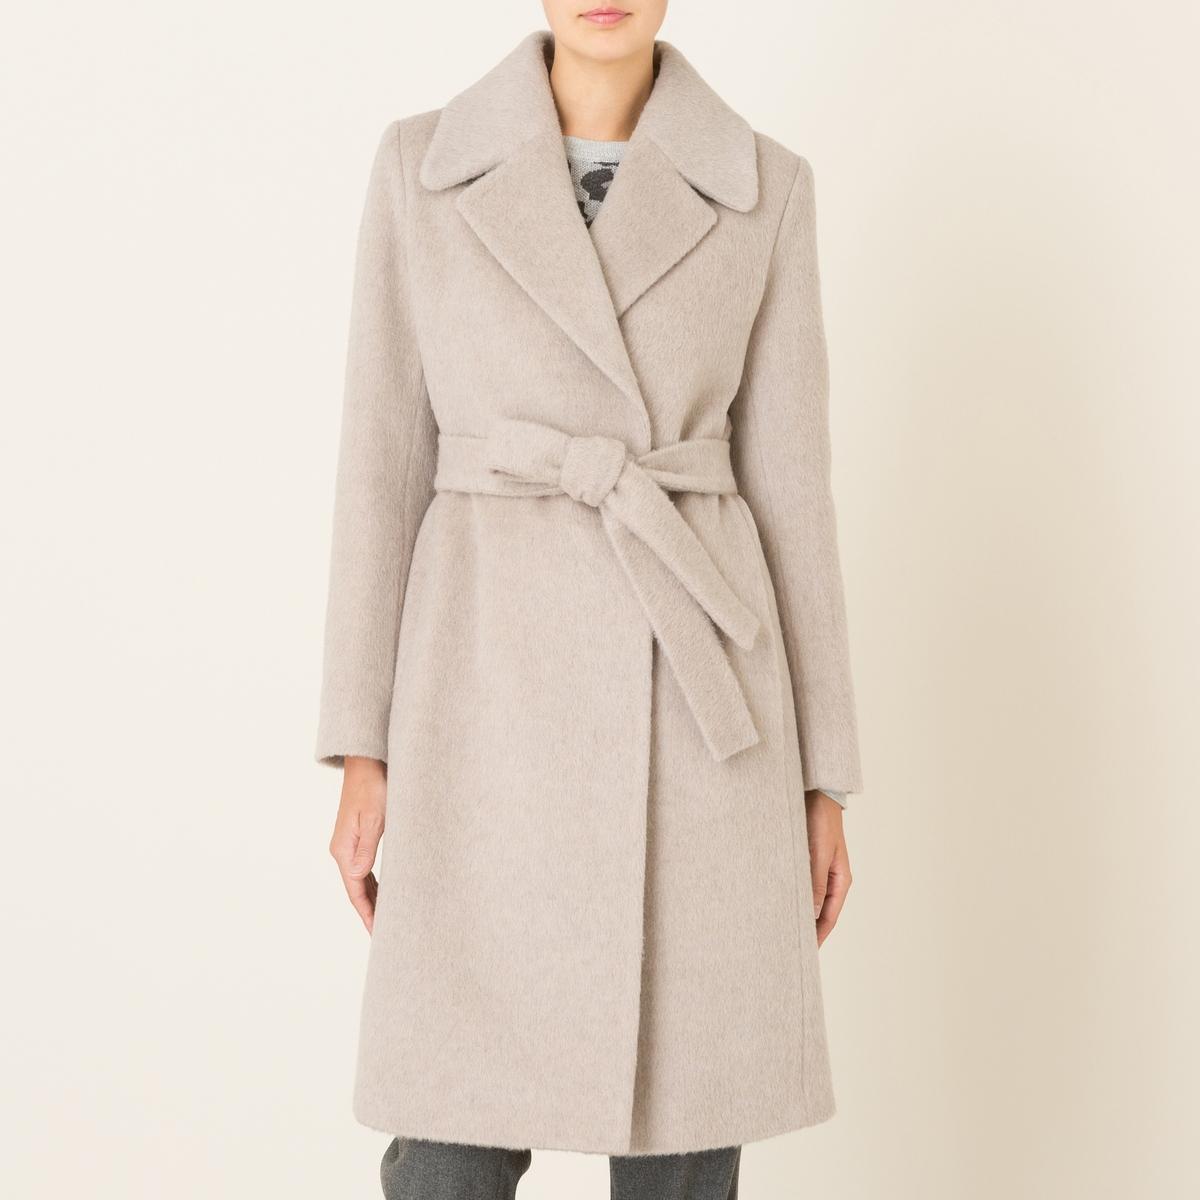 69a9fed4ba6 Пальто длинное из шерстяного драпа - laredoute.ru - imall.com